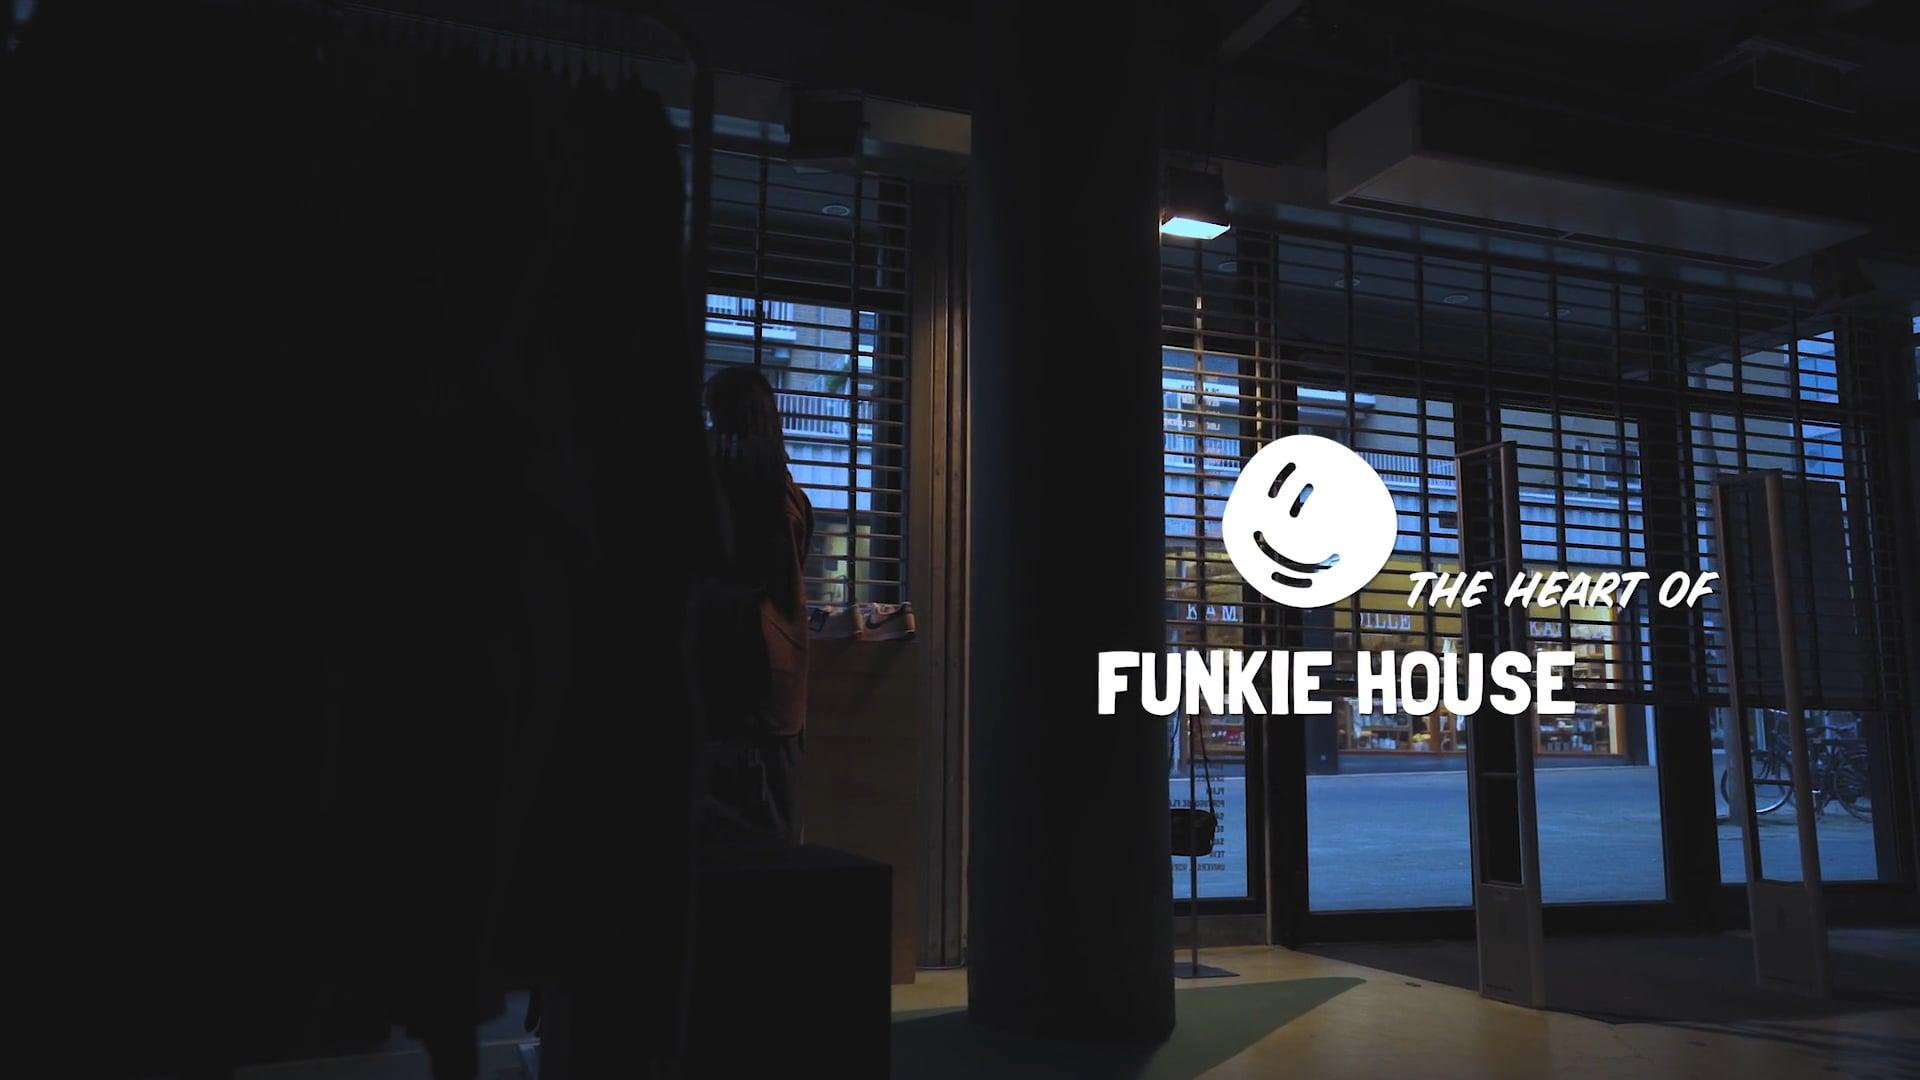 Mediageniek | The heart of Funkie House